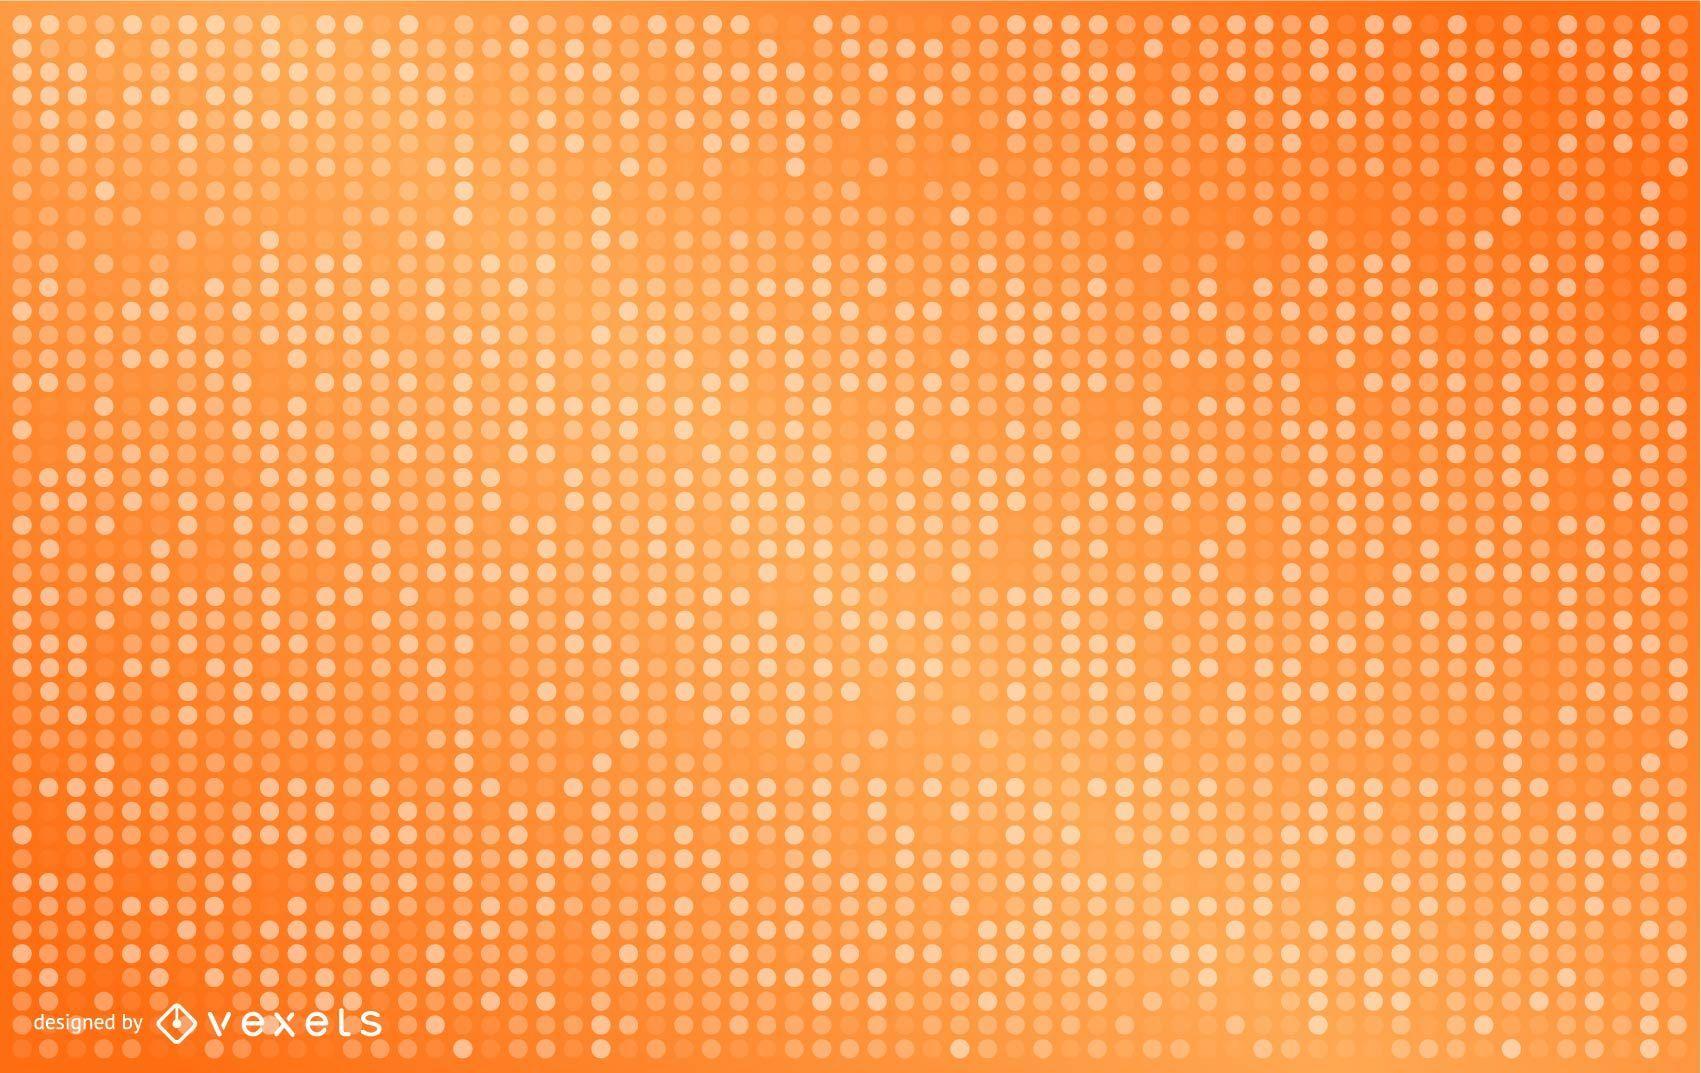 Diseño de fondo naranja punteado